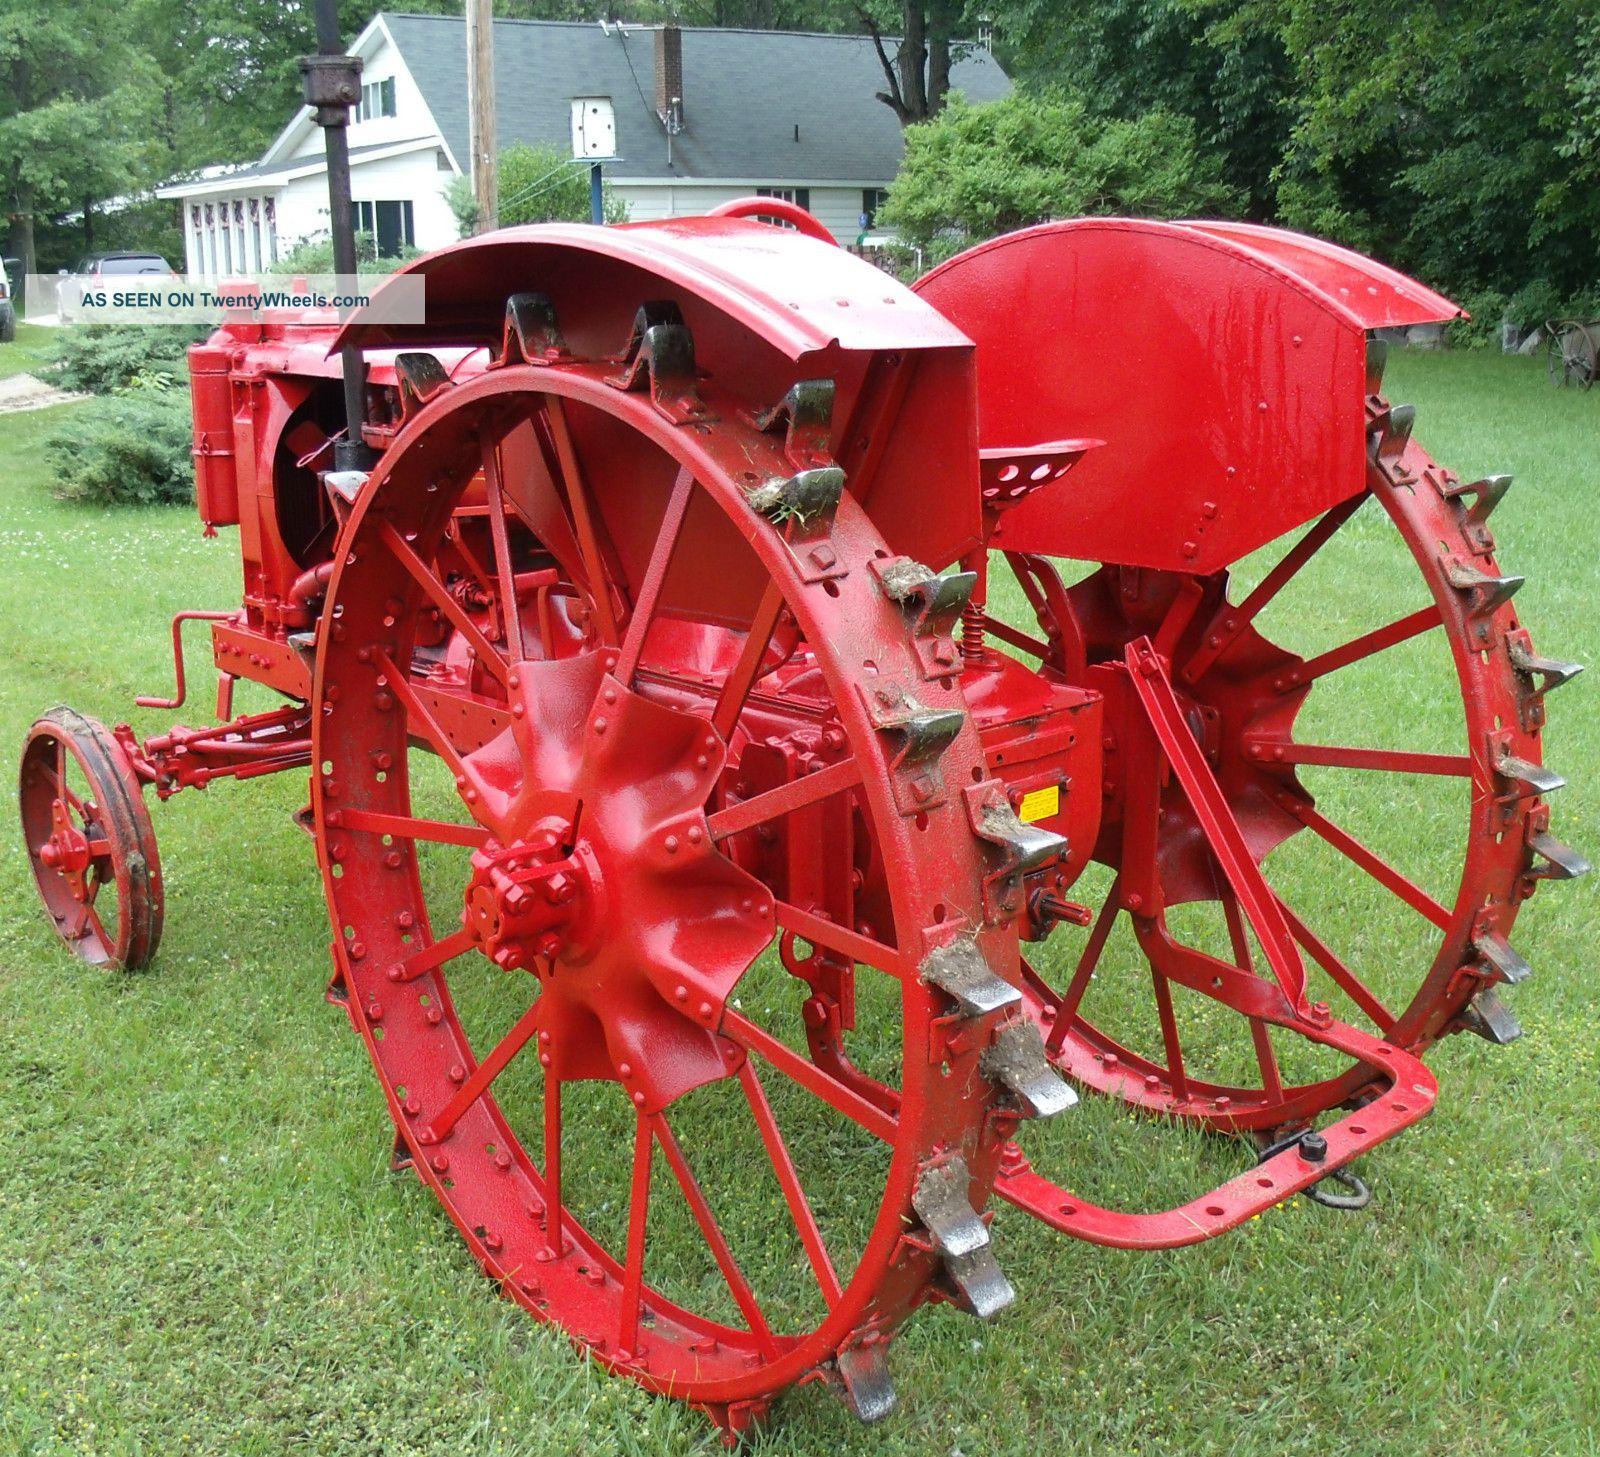 Farmall Steel Wheels : Farmall f wide front full steel vintage tractor